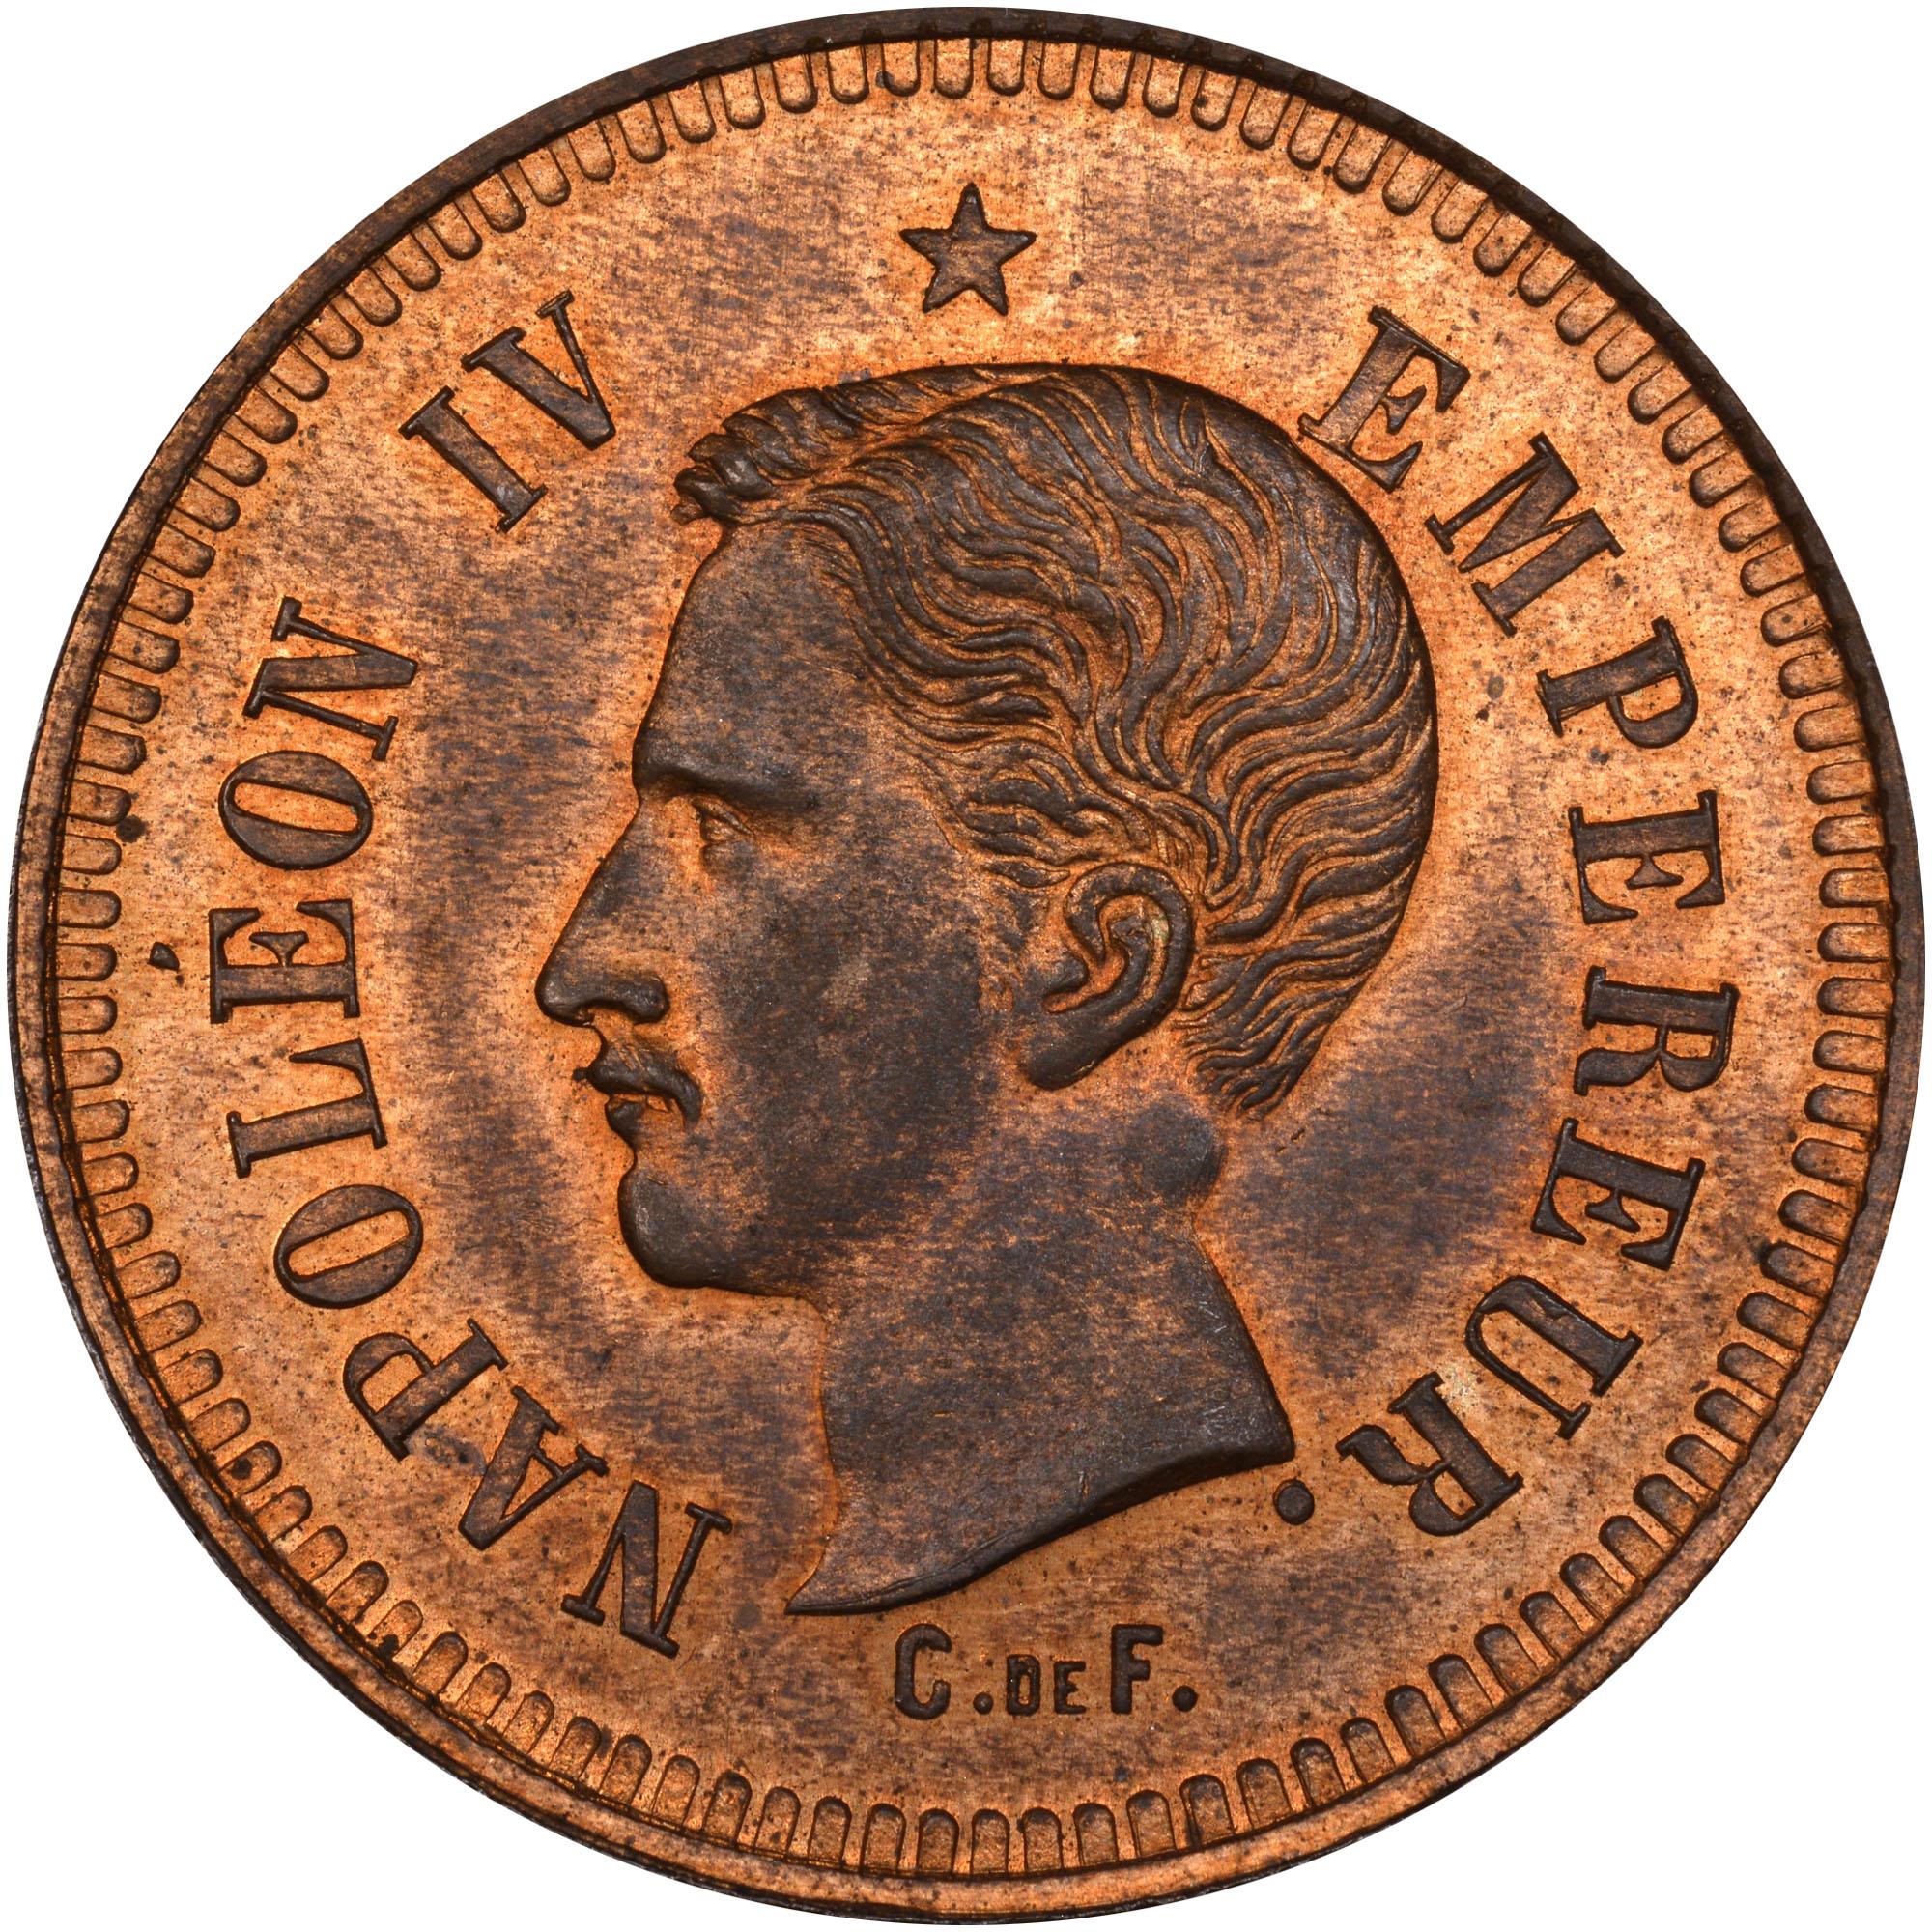 1874 France 10 Centimes obverse